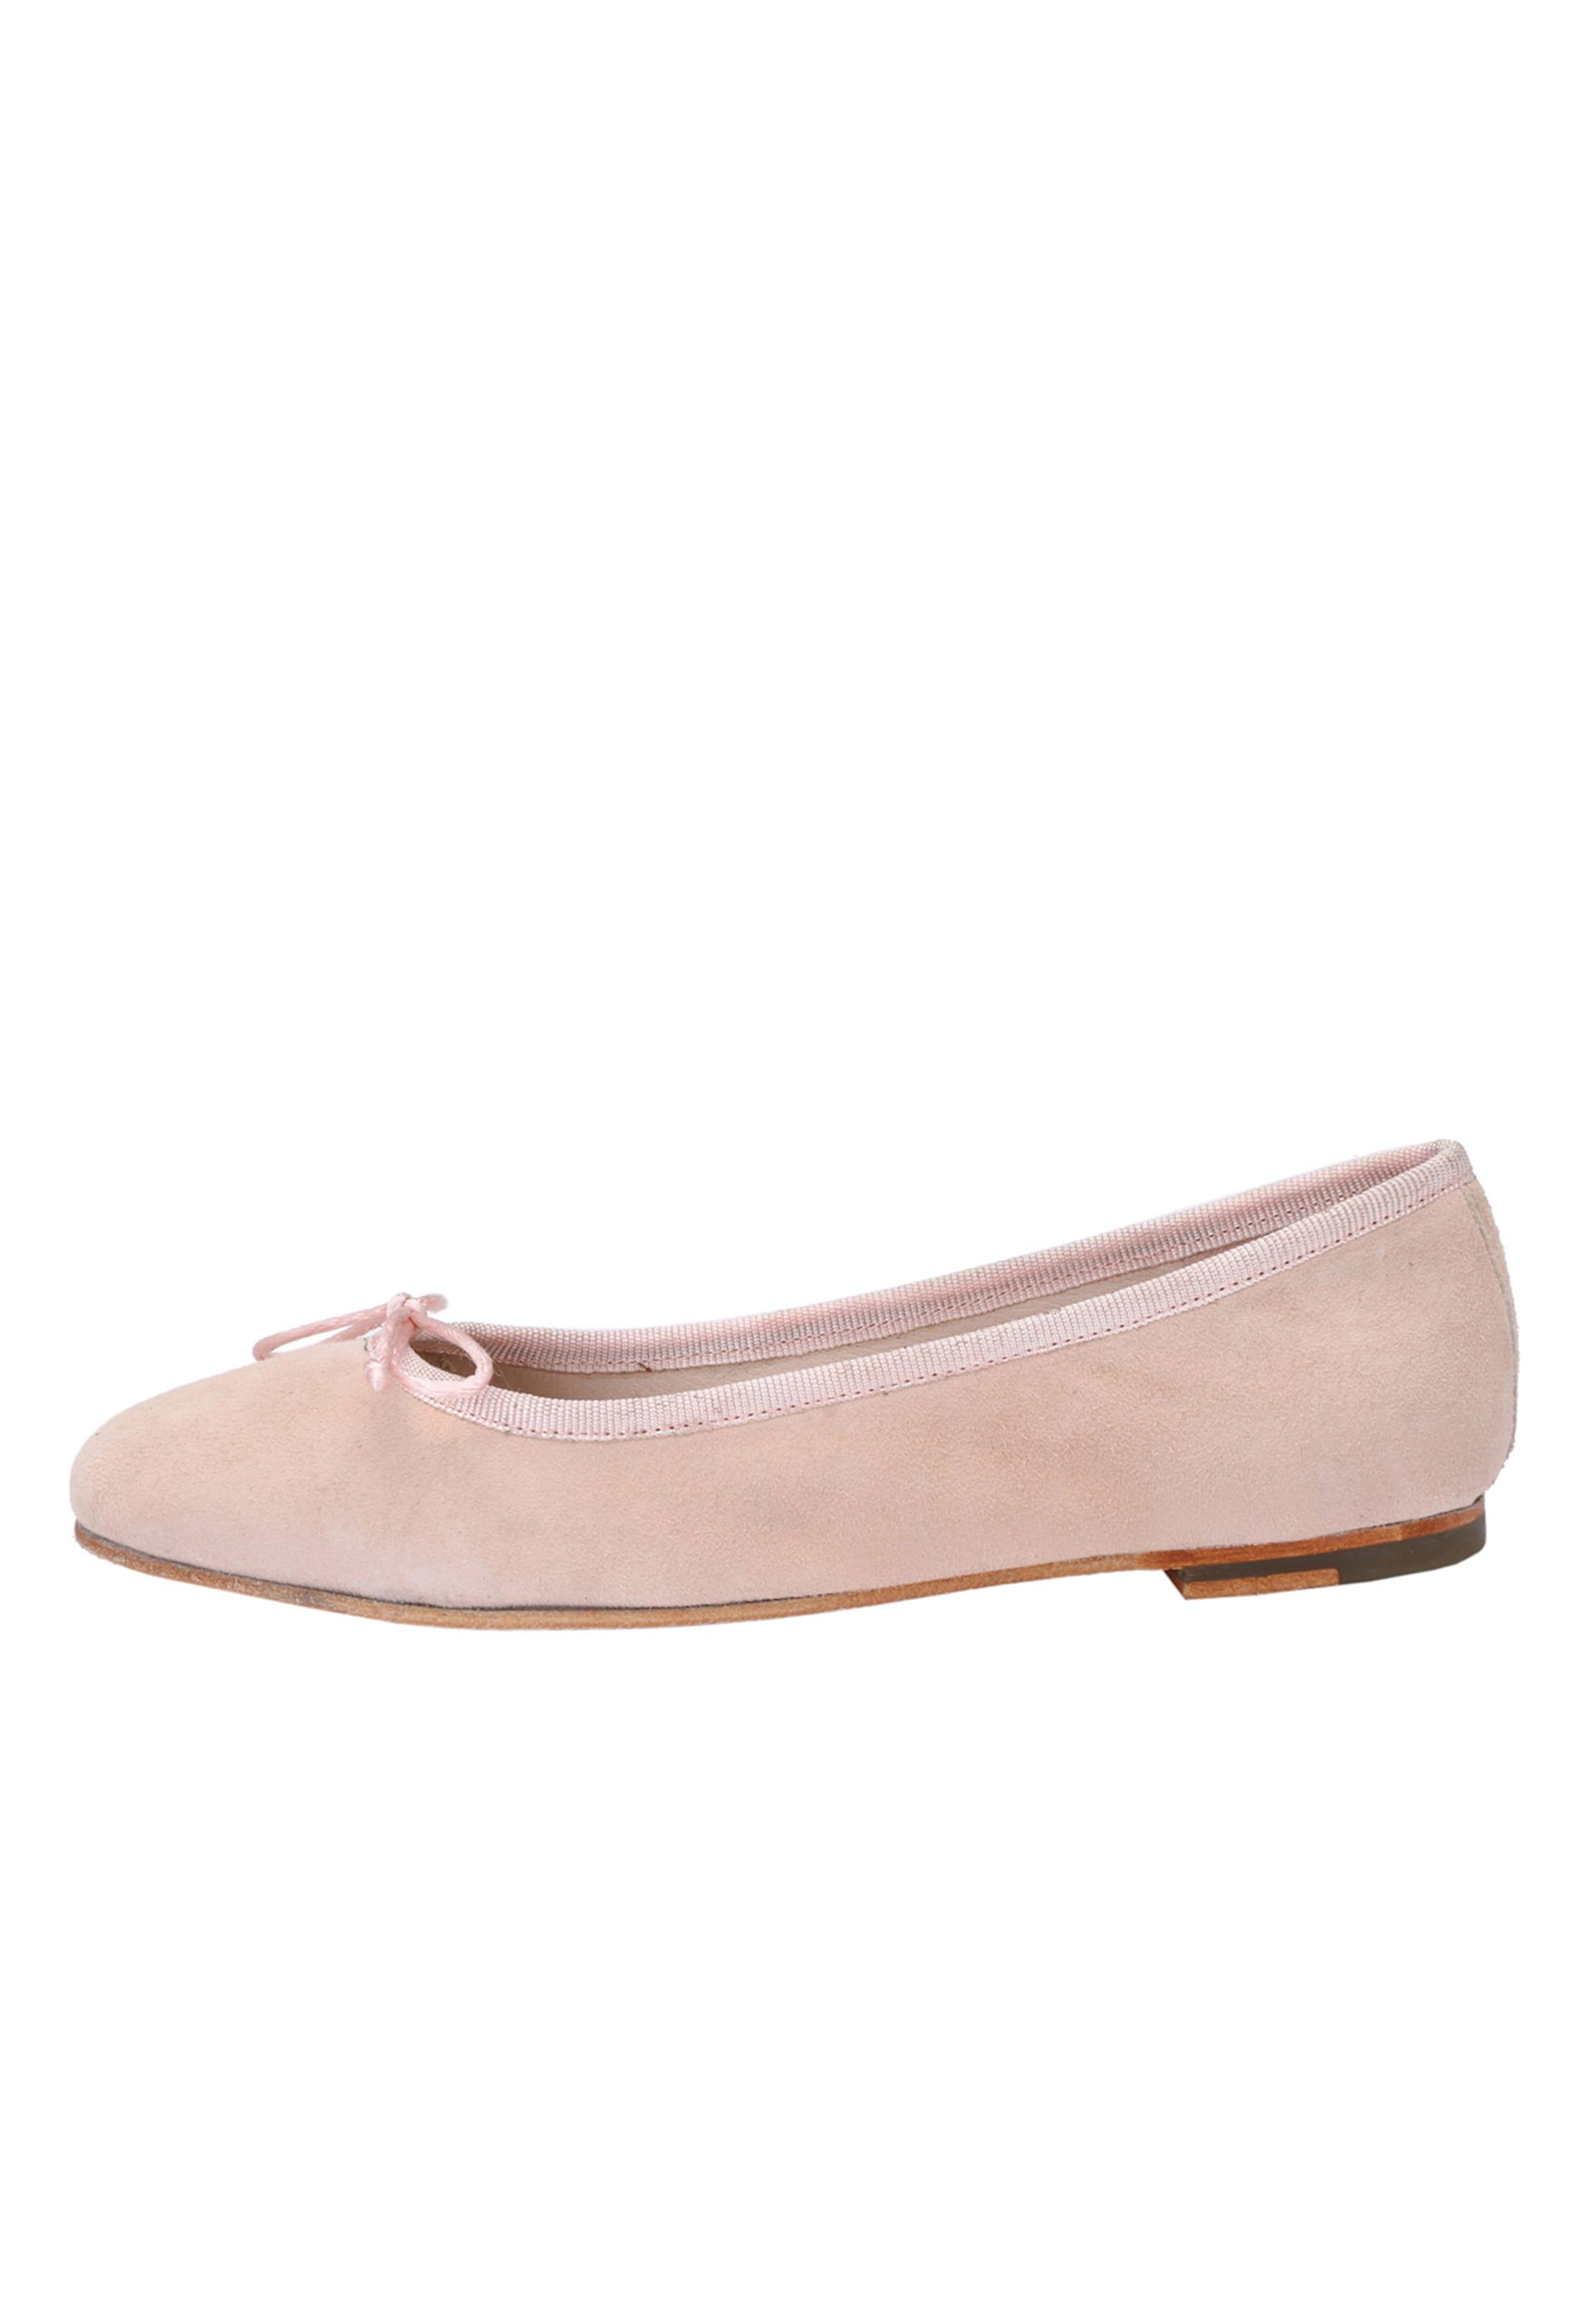 PinkRosa Crickit 'ivy' In Crickit In Ballerinas Ballerinas 'ivy' PinkRosa nPN8w0kOX